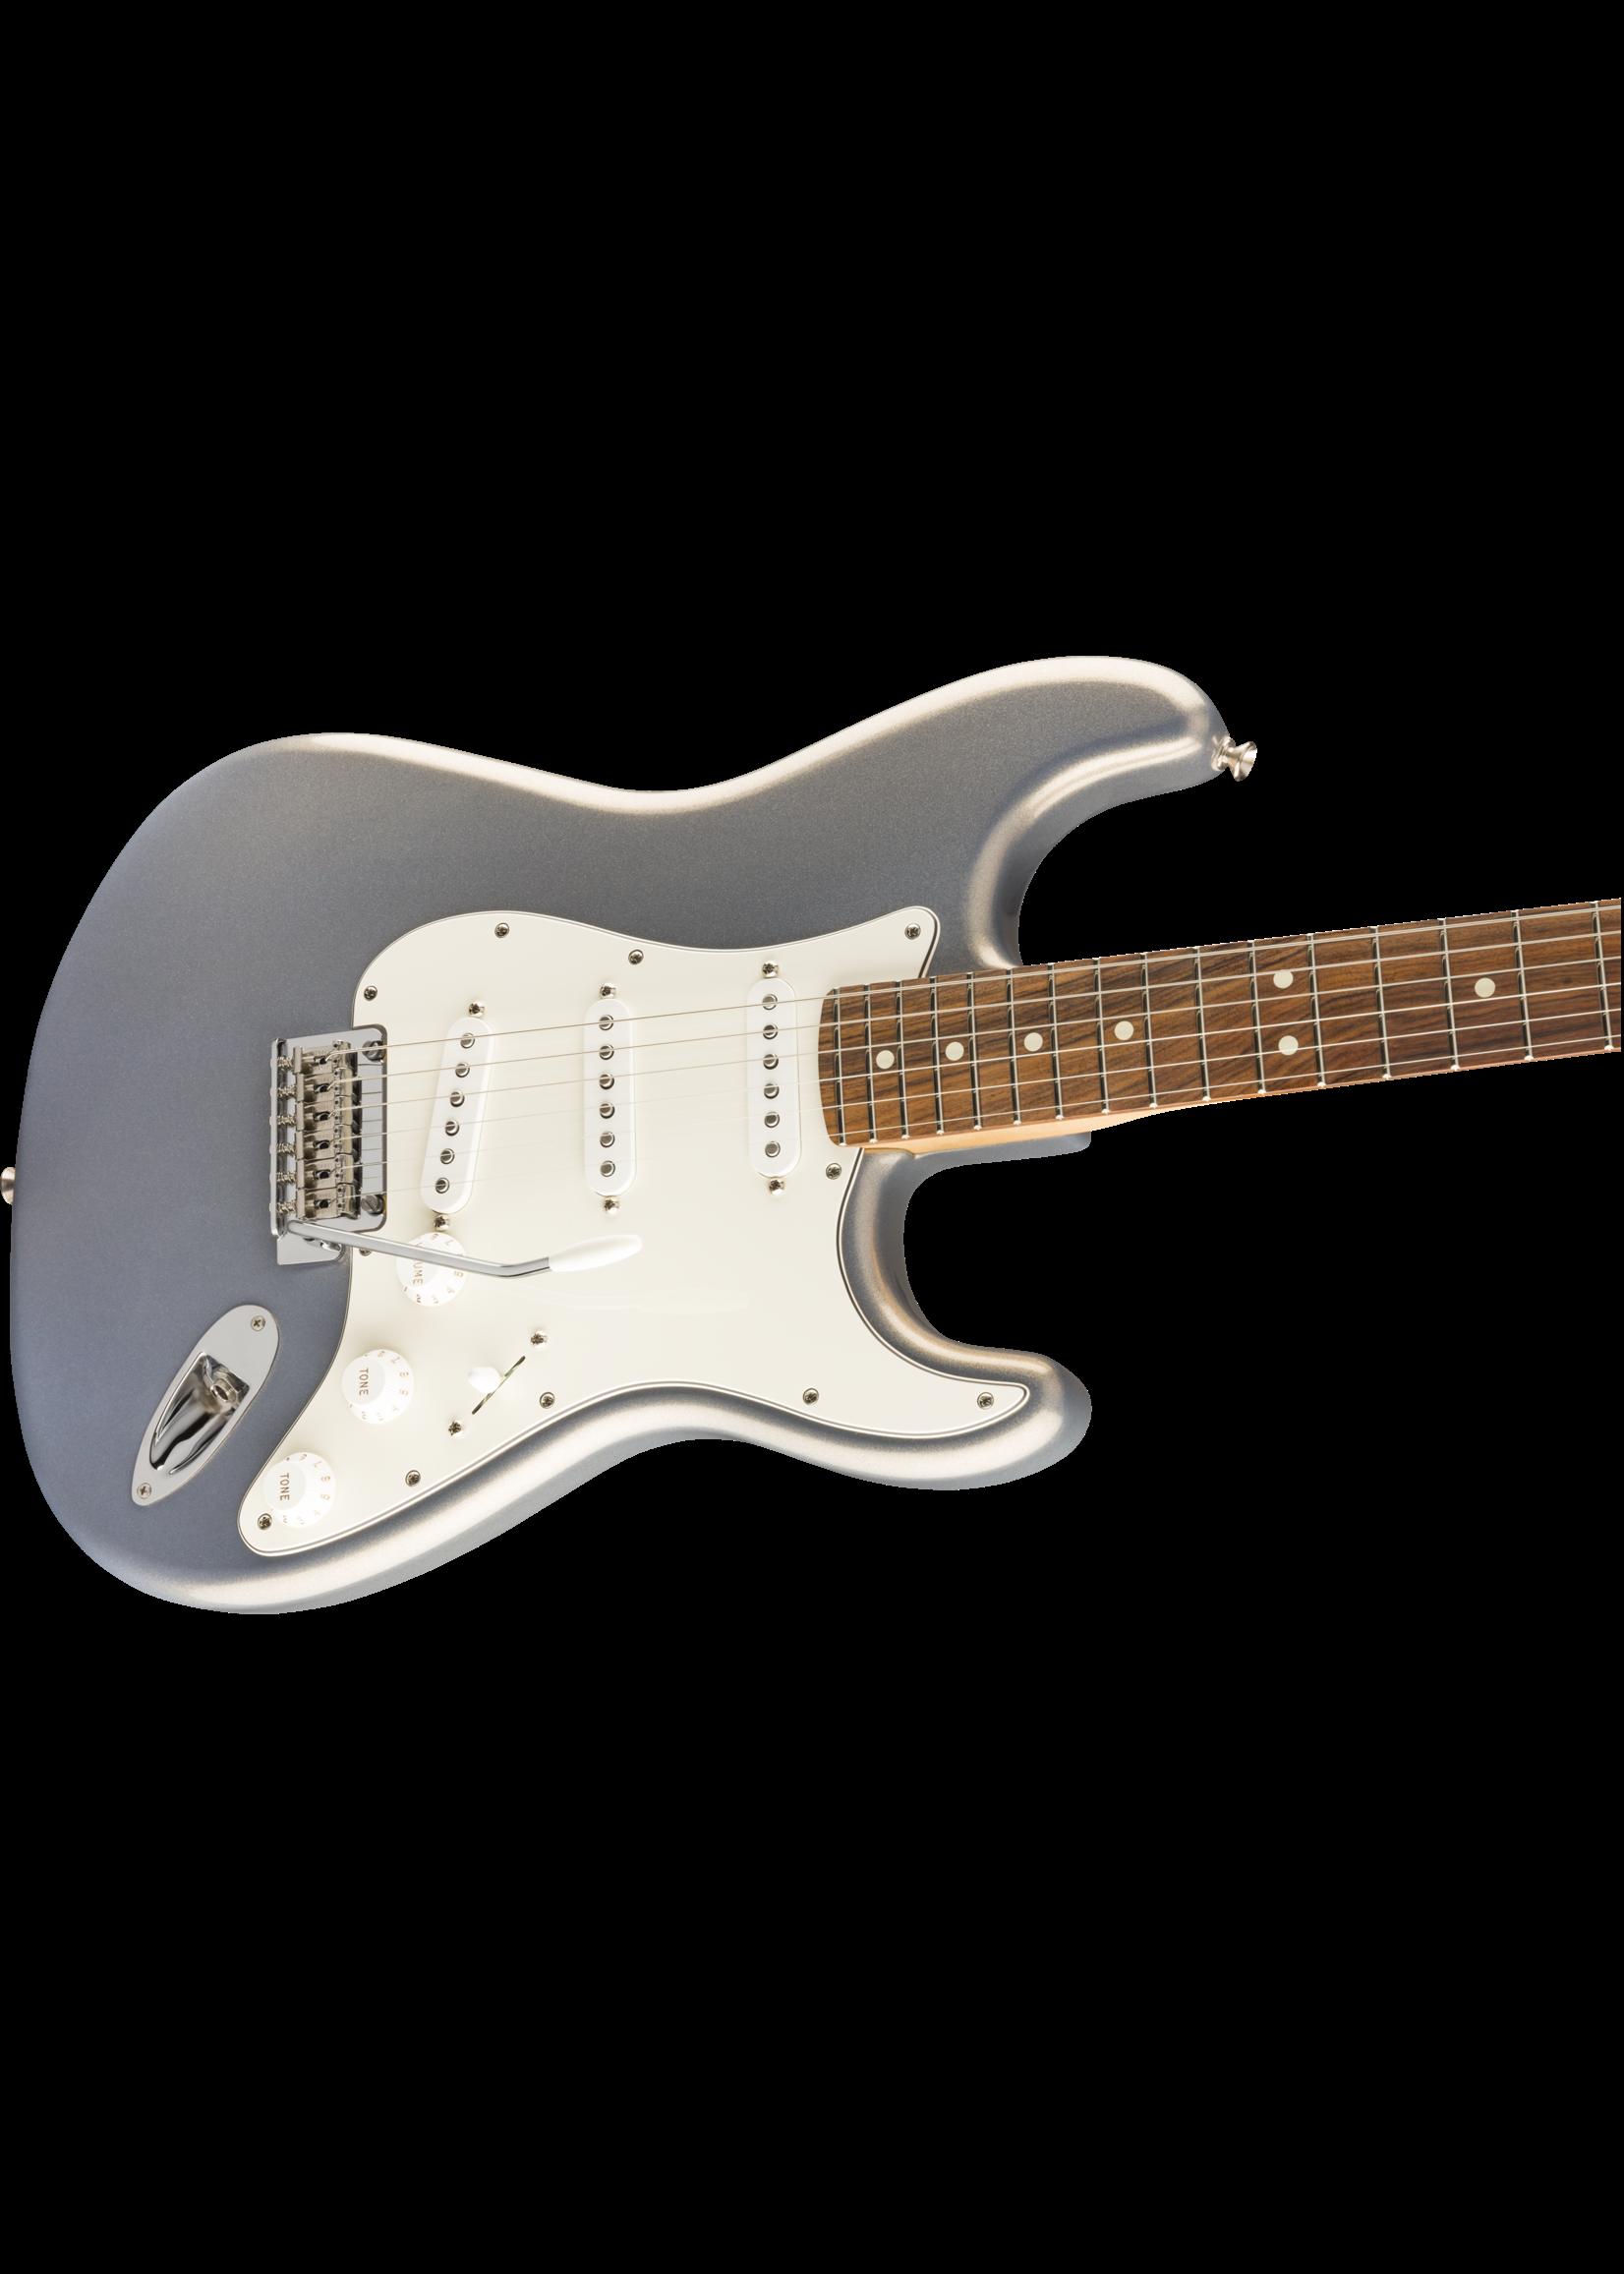 Fender Fender Player Stratocaster with Pau Ferro Fretboard Silver